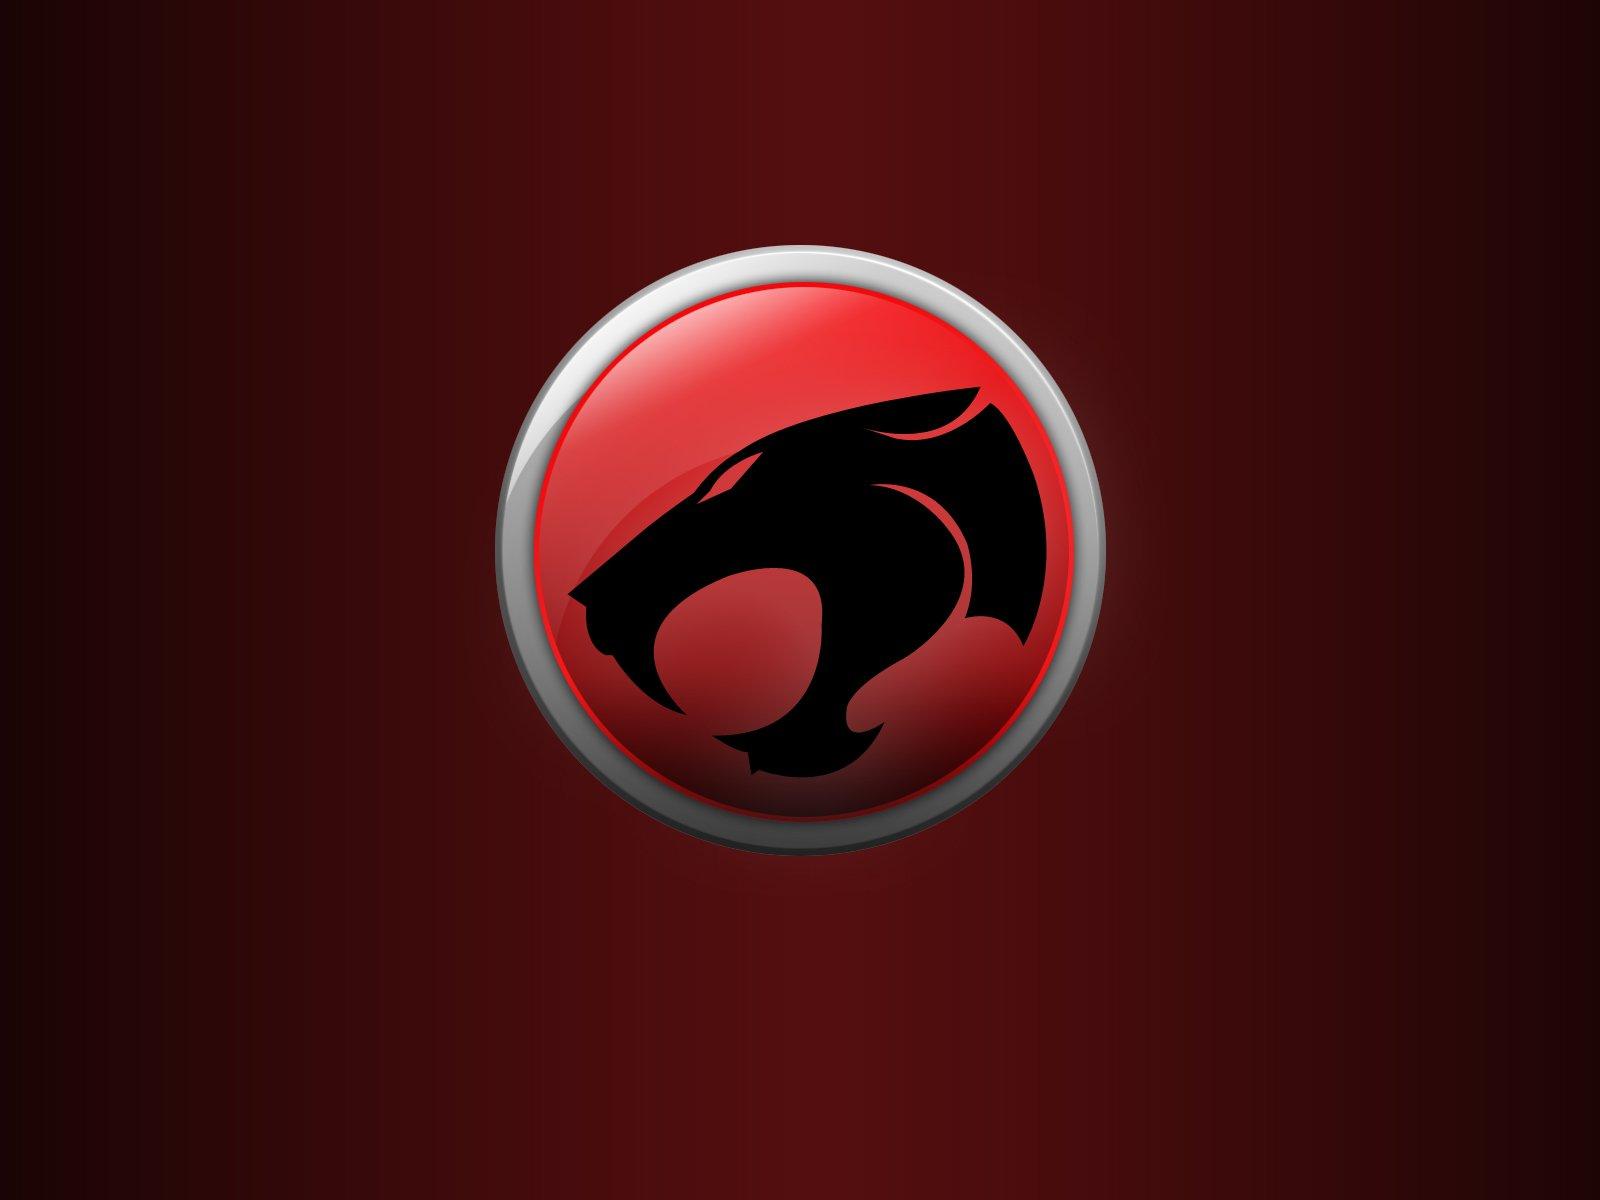 Thundercats logo wallpaper - SF Wallpaper